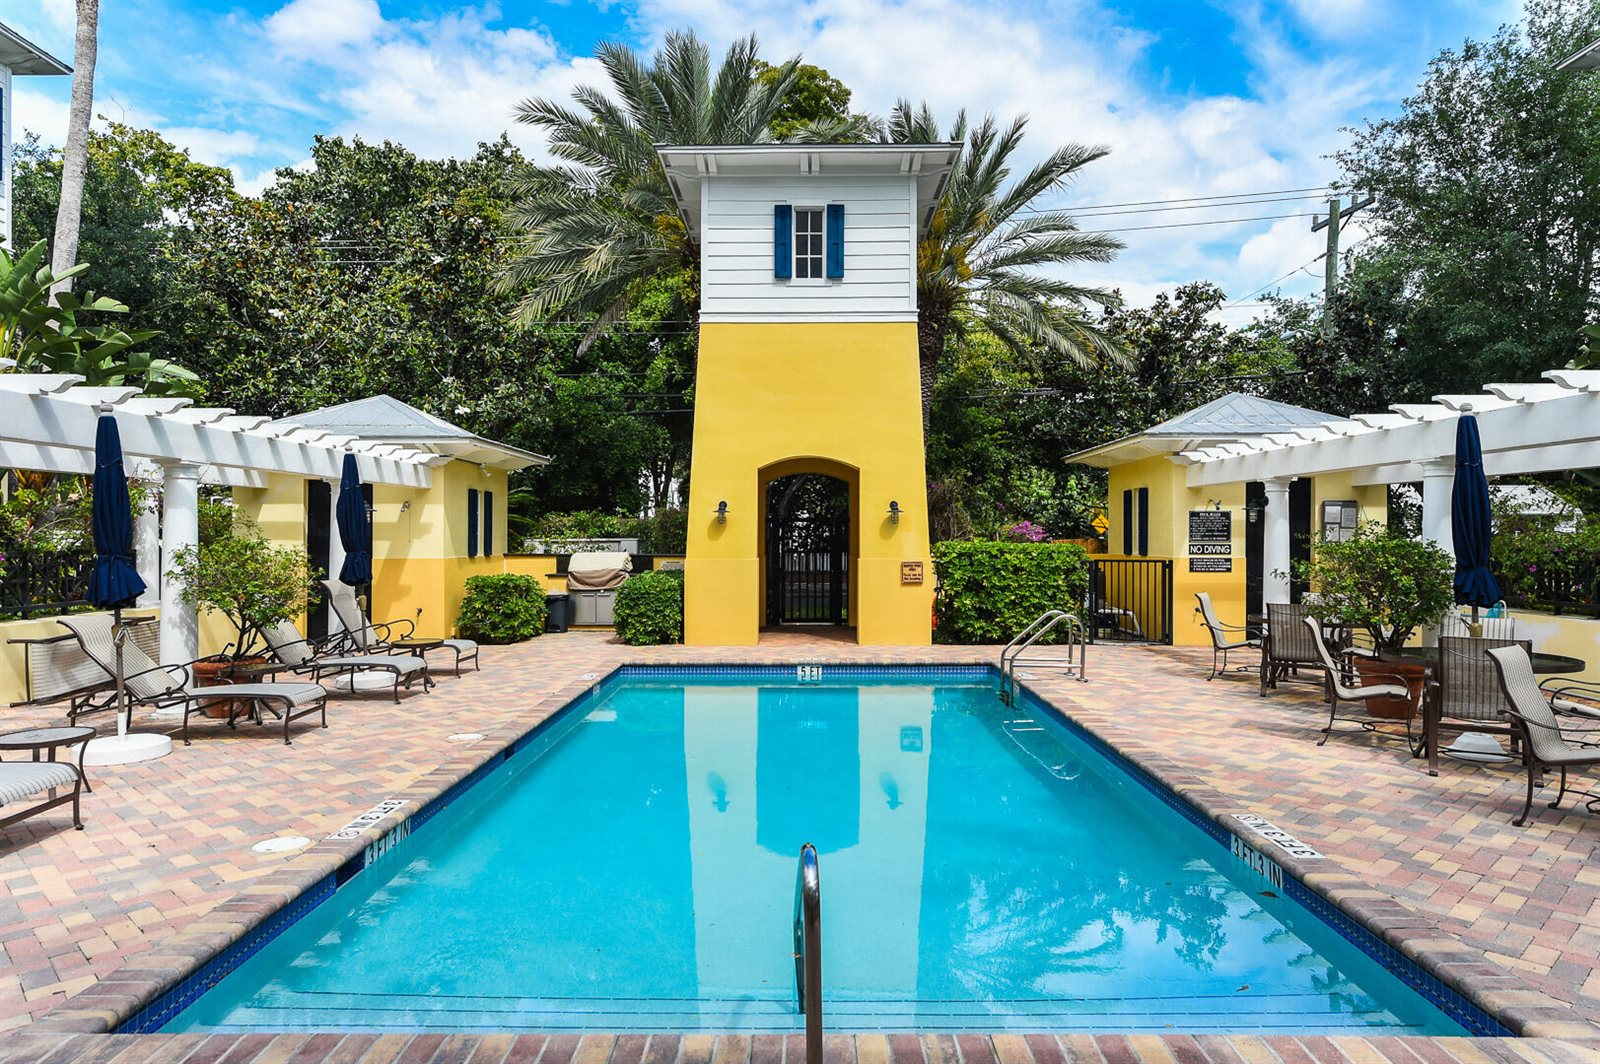 317 South Bromeliad, West Palm Beach, FL 33401